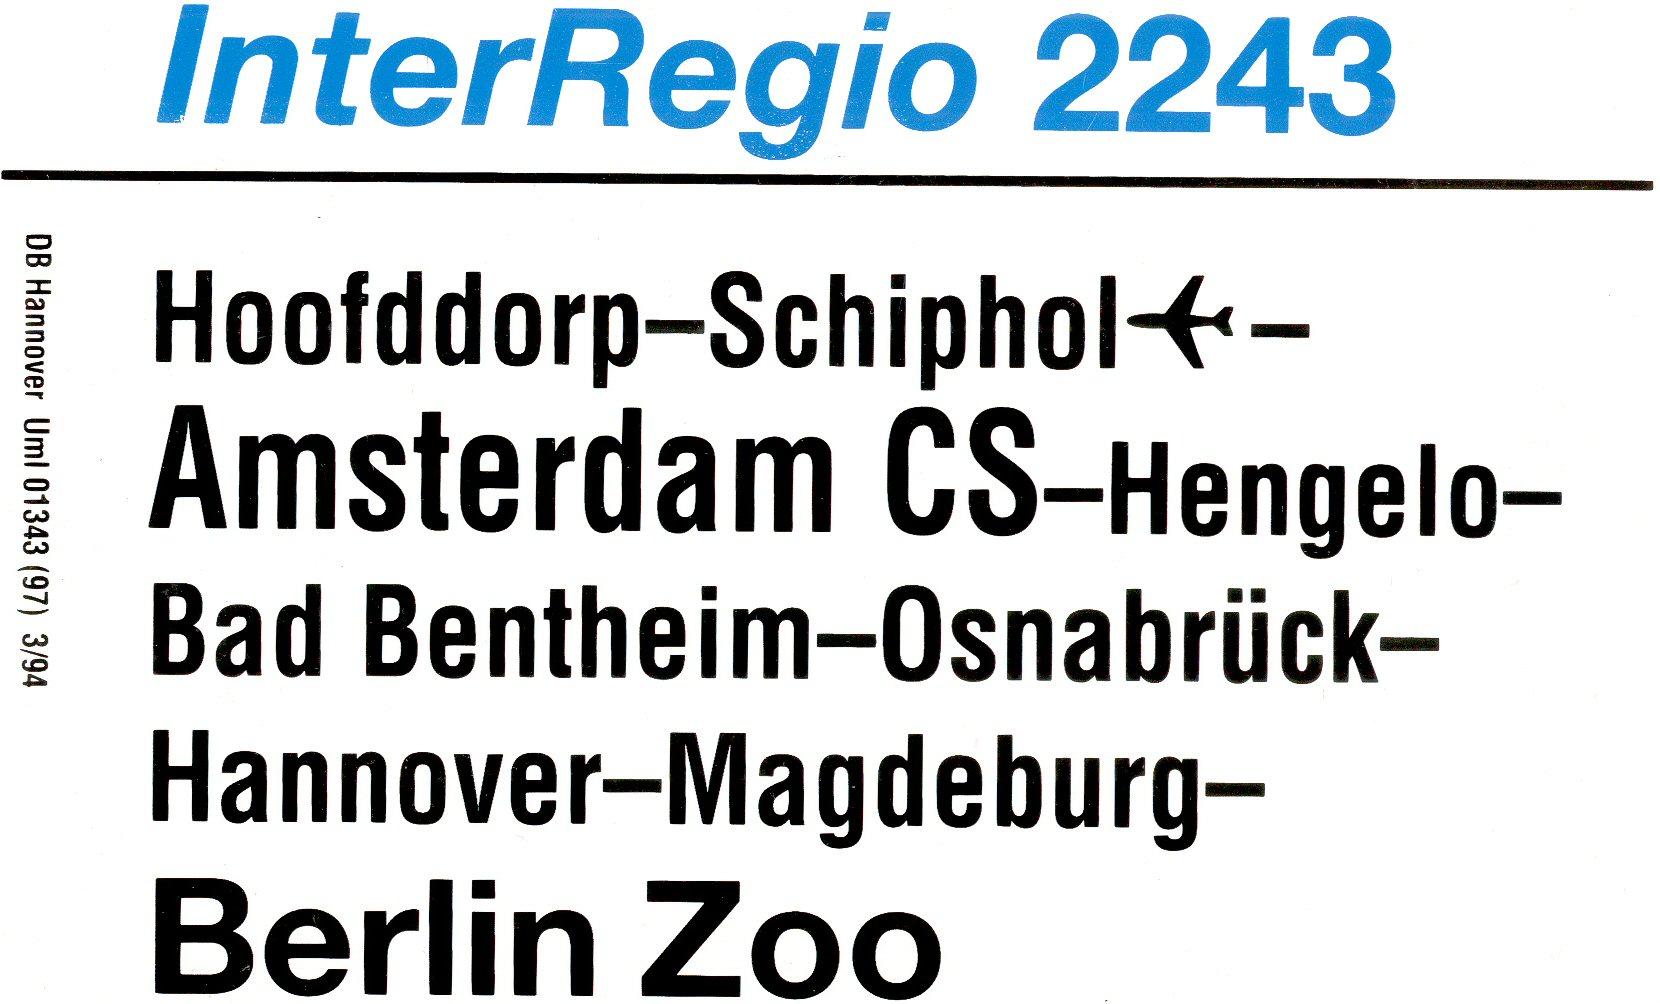 File:Interregio 2243 Hoofddorp-Berlin Zoo.jpg